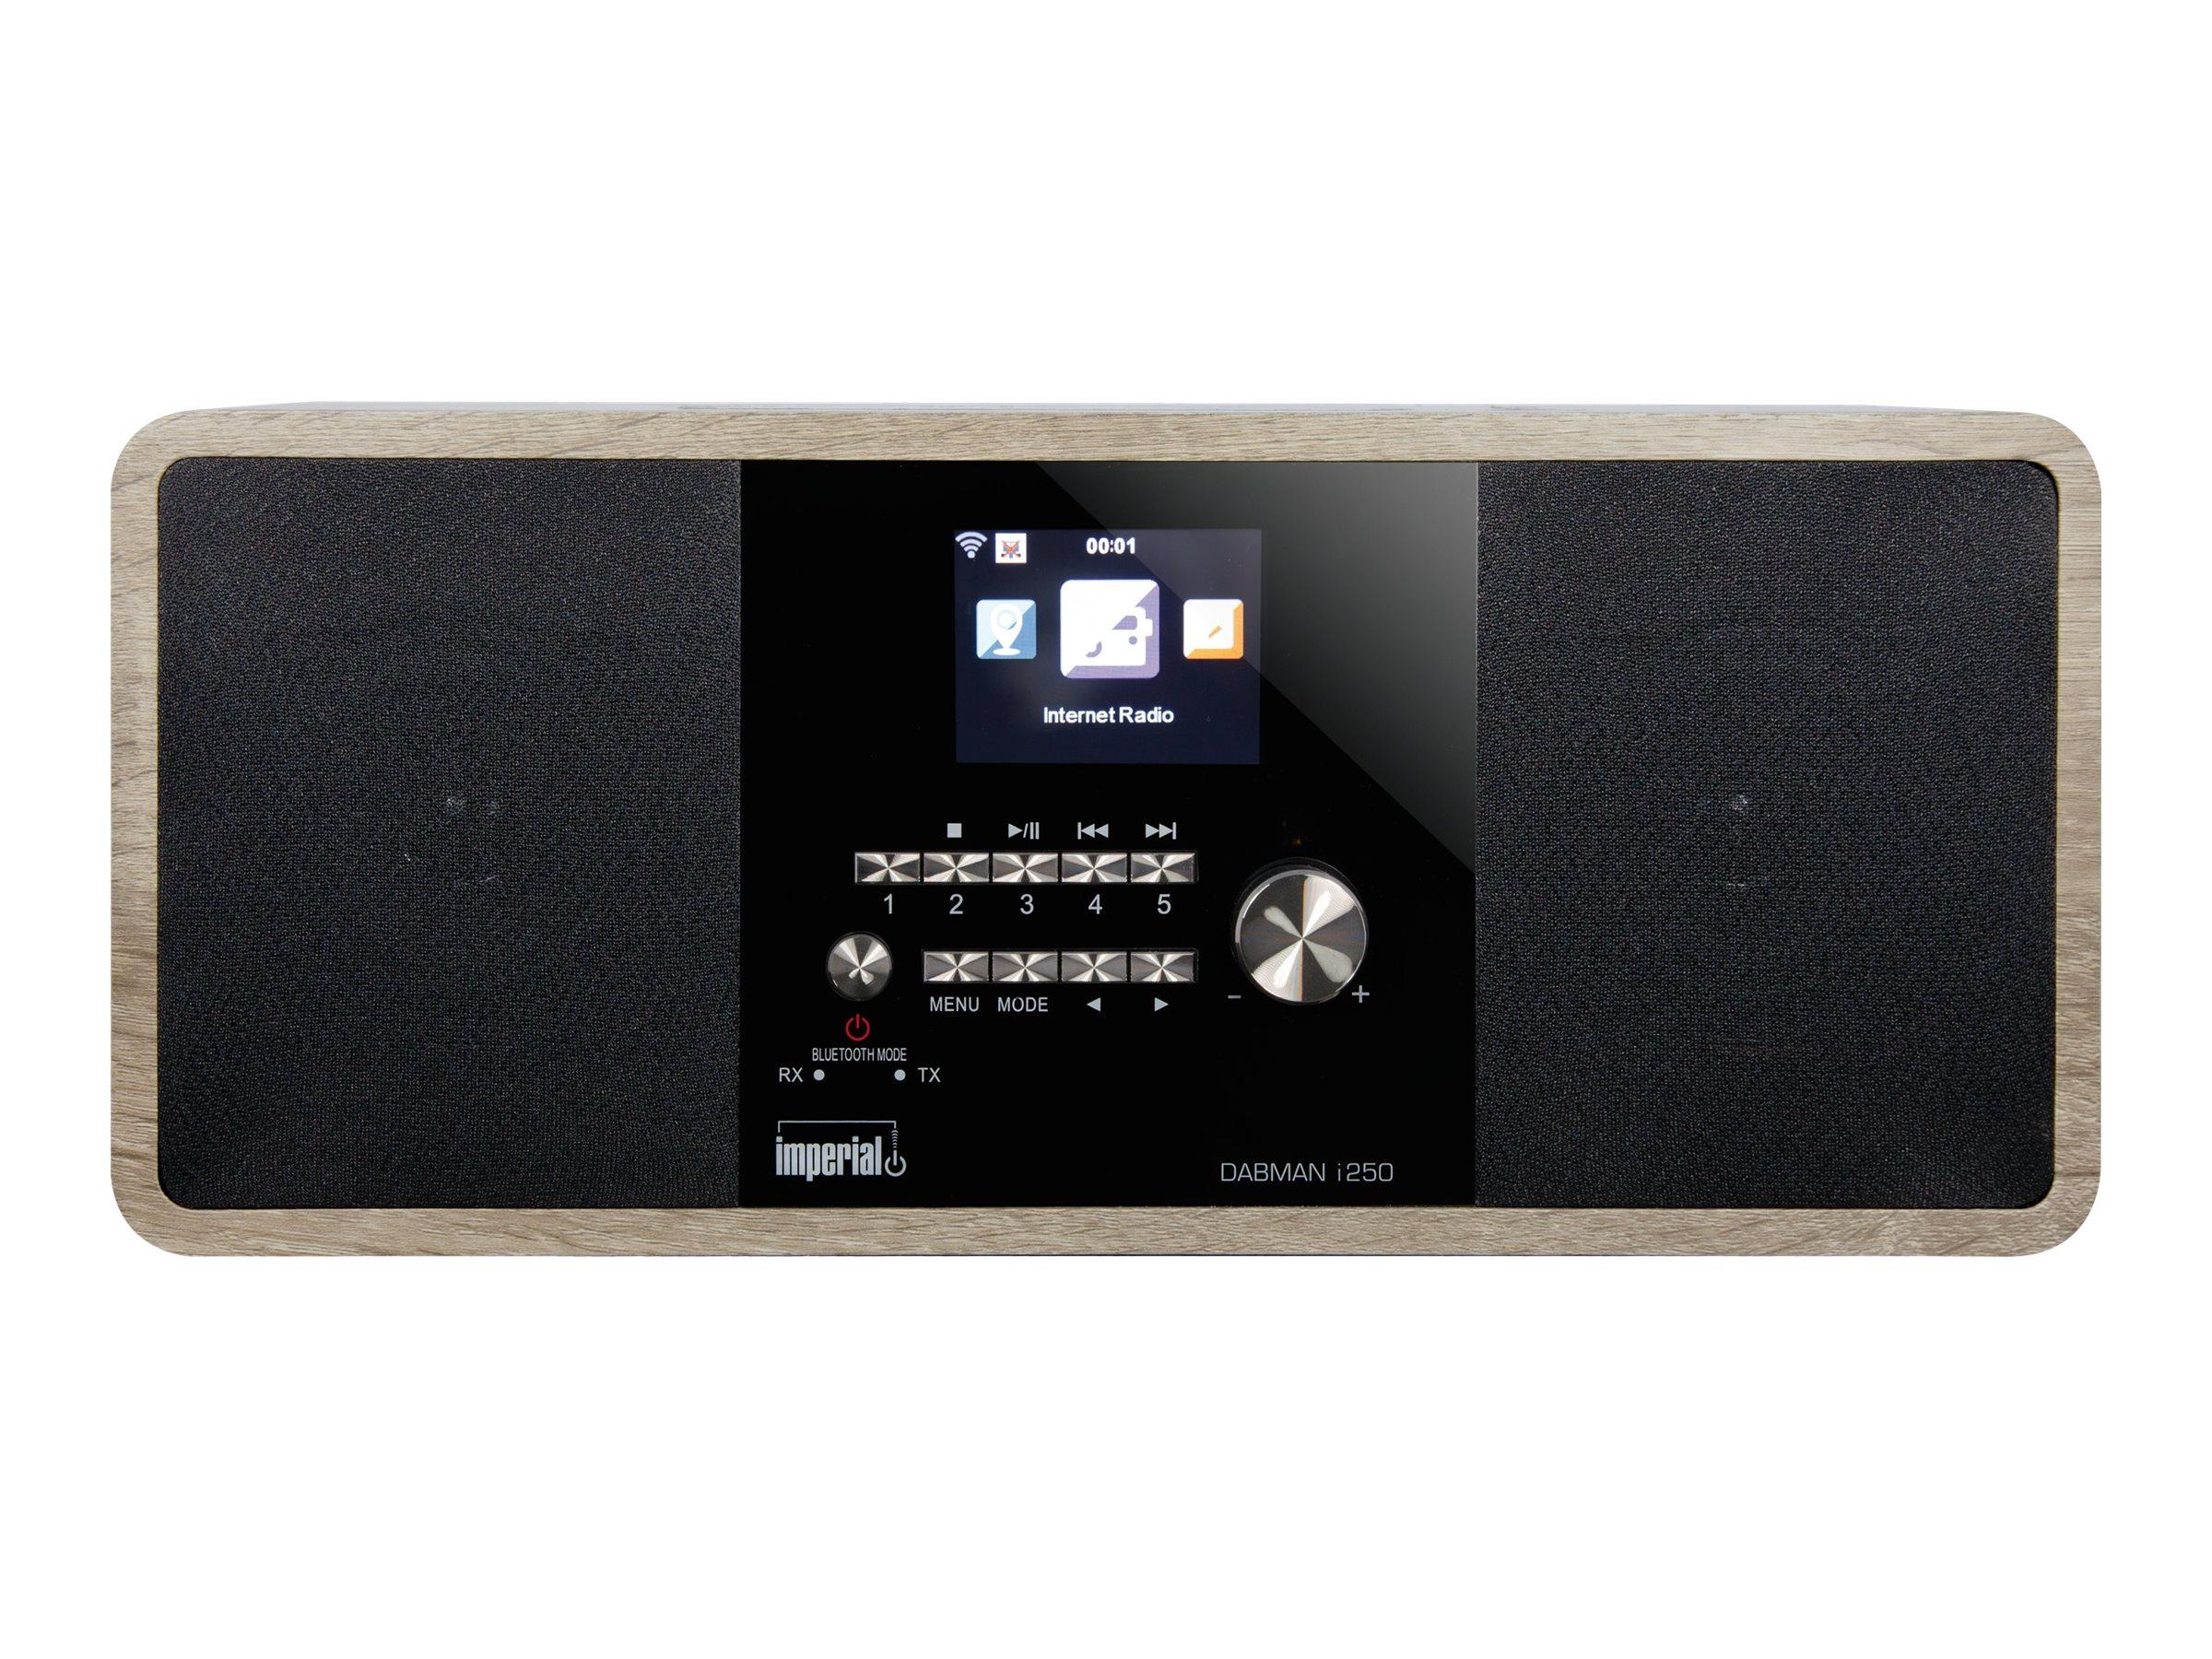 Telestar imperial DABMAN i250 - Netzwerk-Audio-Player - 20 Watt (Gesamt)